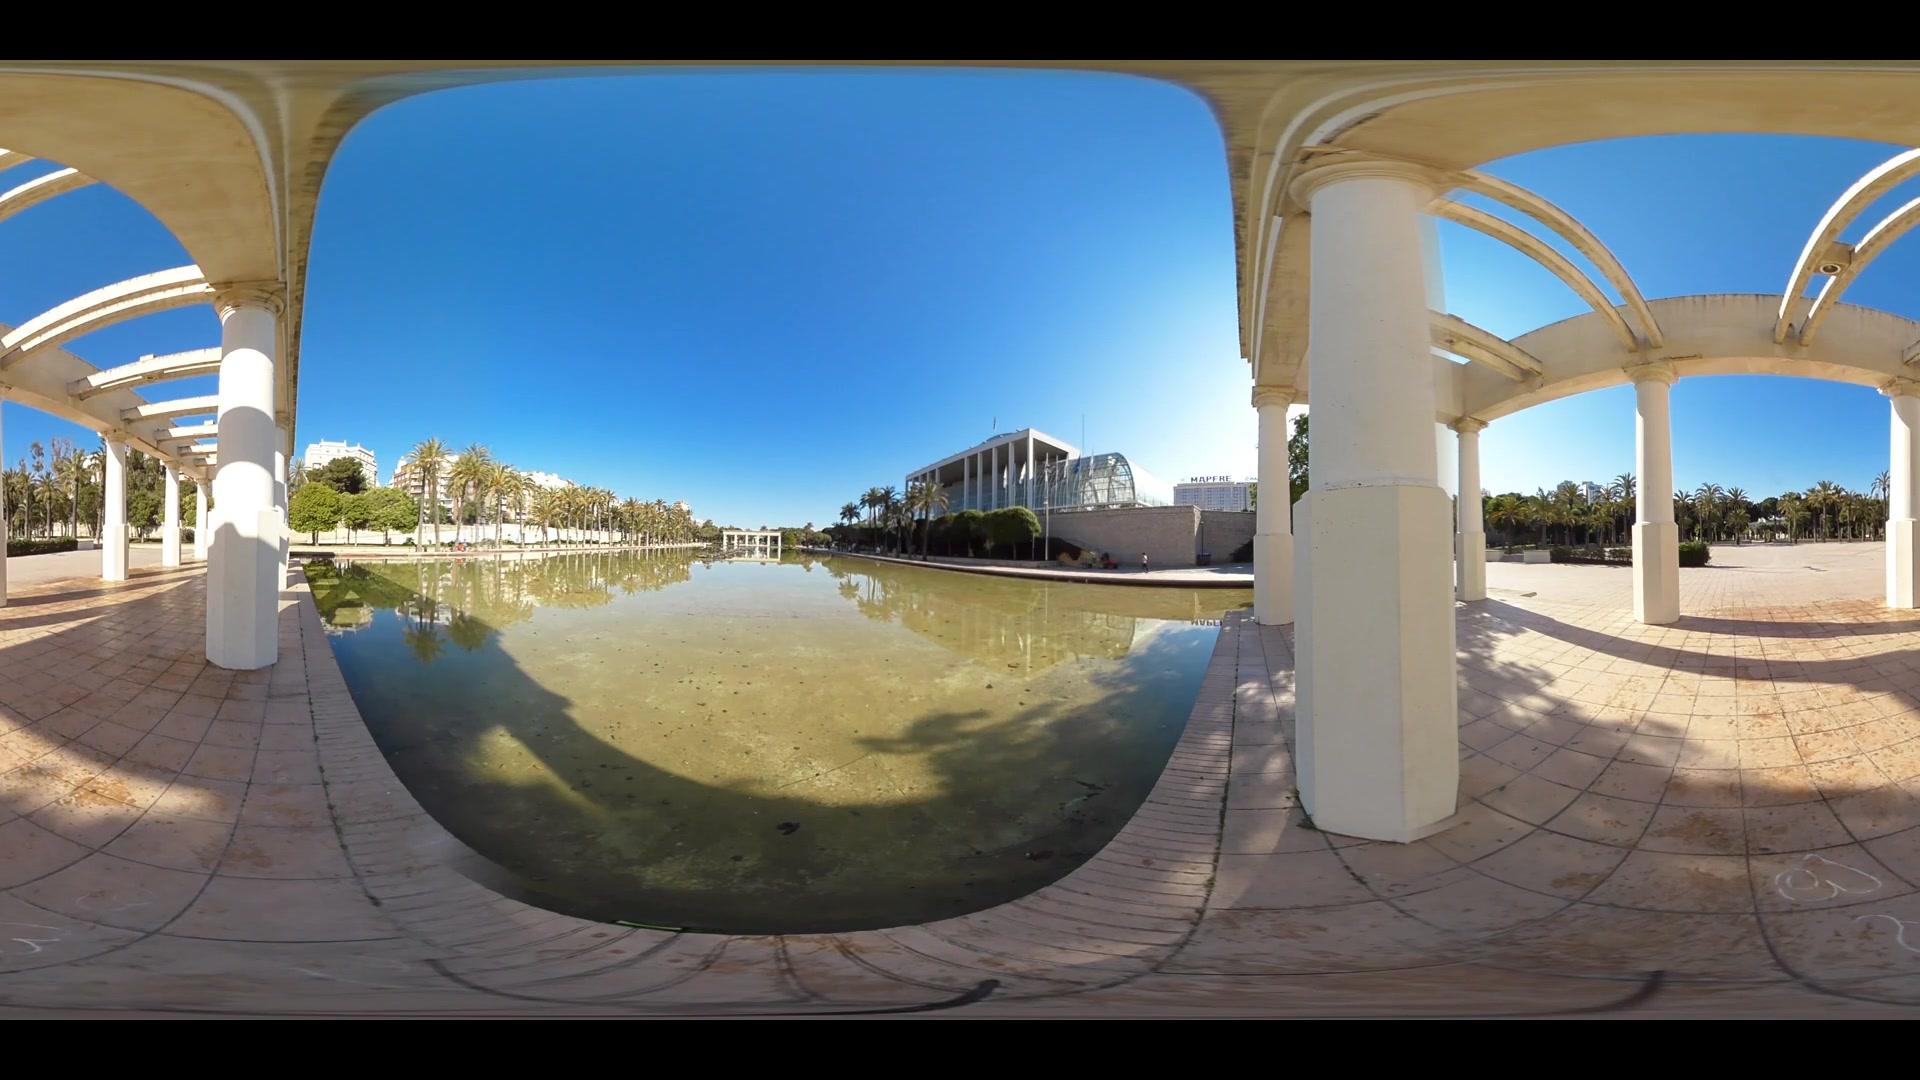 Virtual Reality 360 view from the Palau de la Musica in Valencia Spain